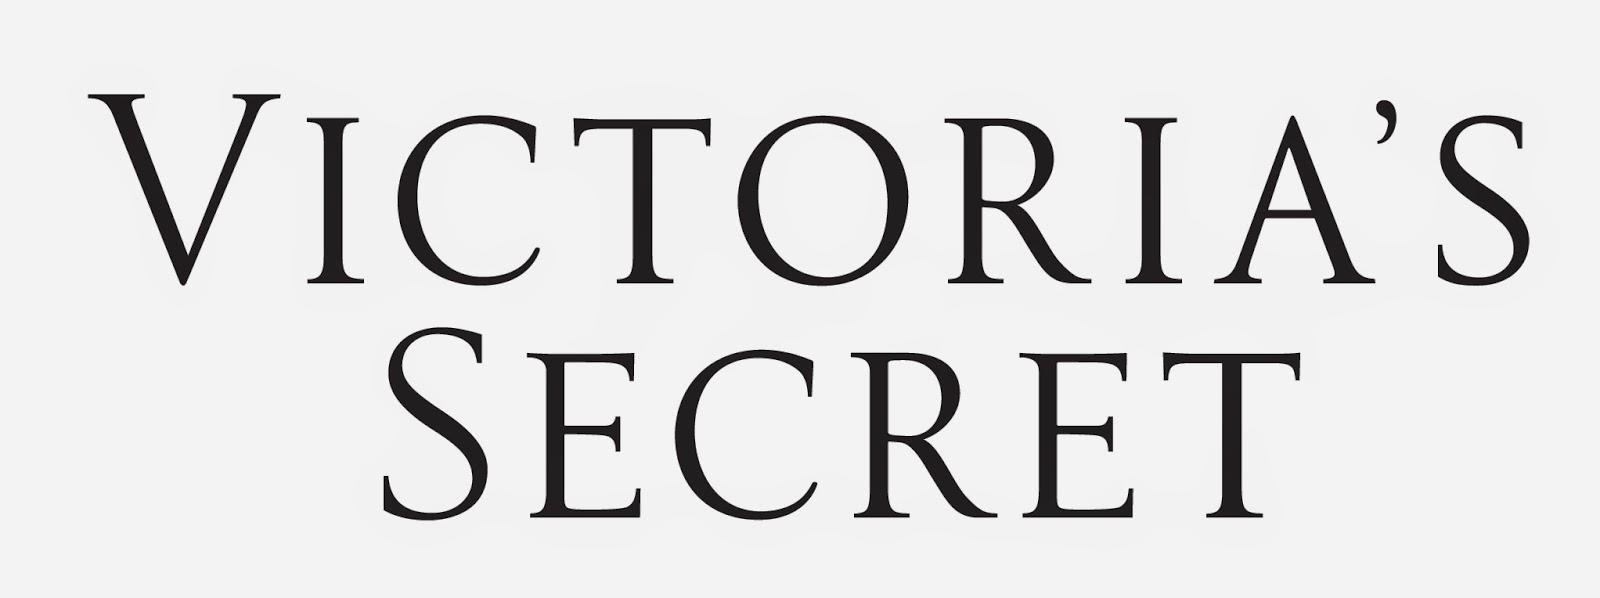 Victoria Secret Logo by http://rhinestonecowgirlnyc.blogspot.com/